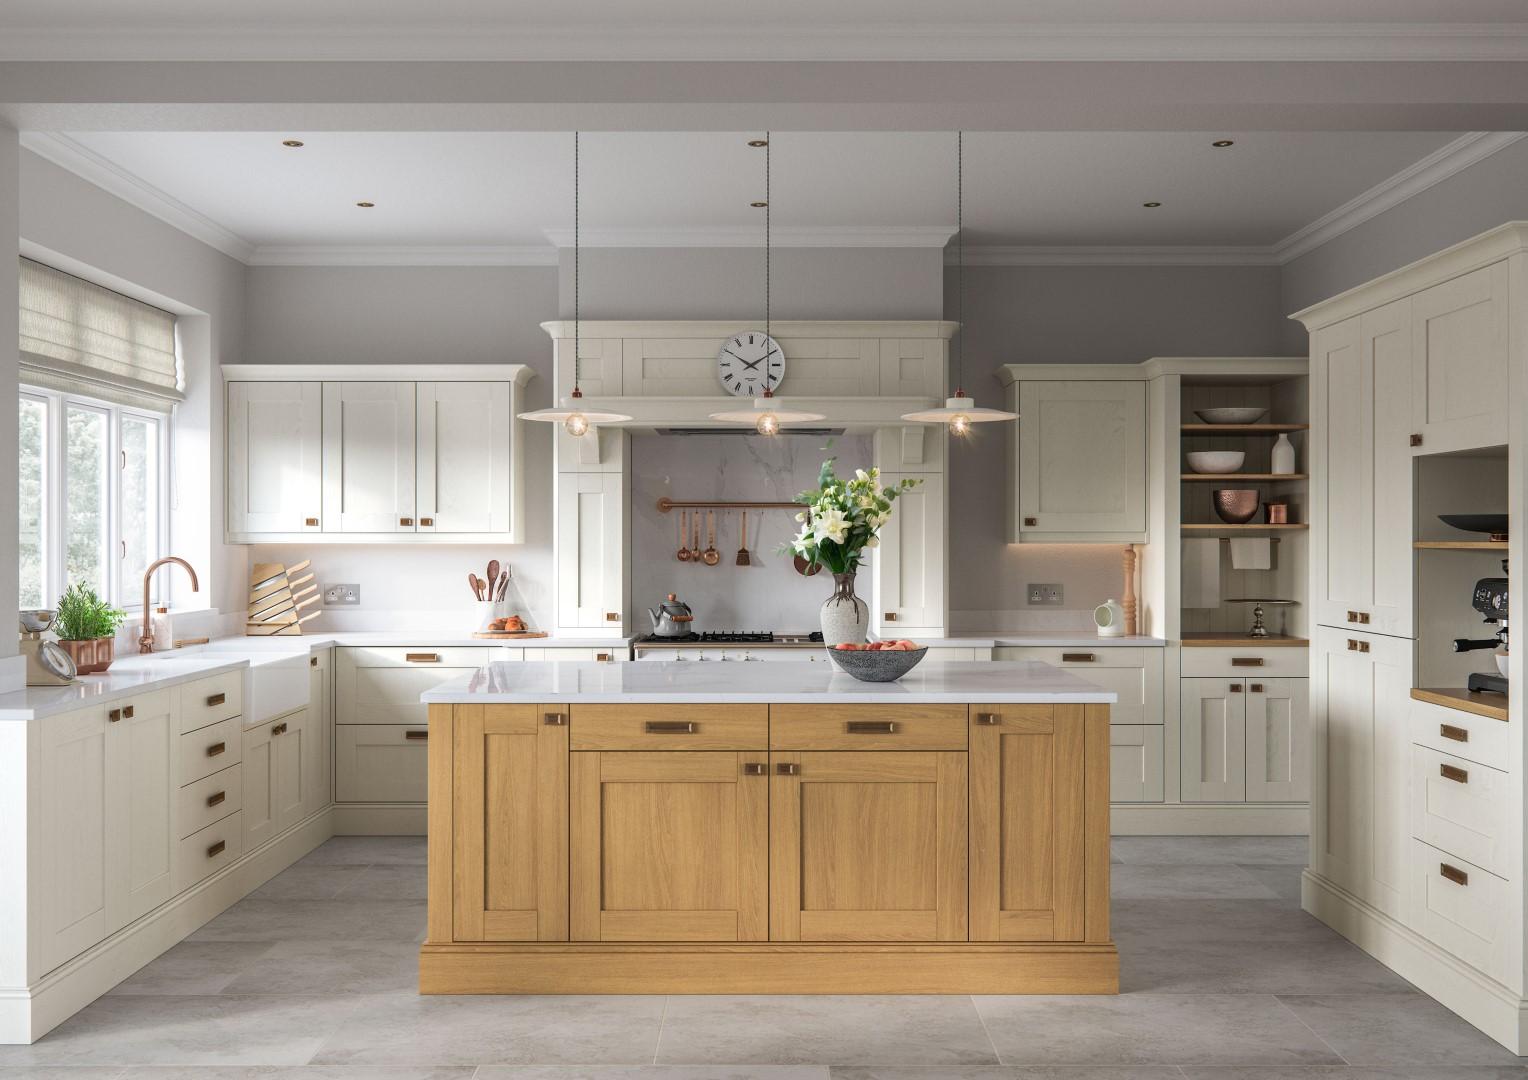 Madison Light Oak and Ivory - Kitchen Design - Alan Kelly Kitchens - Waterford - 5